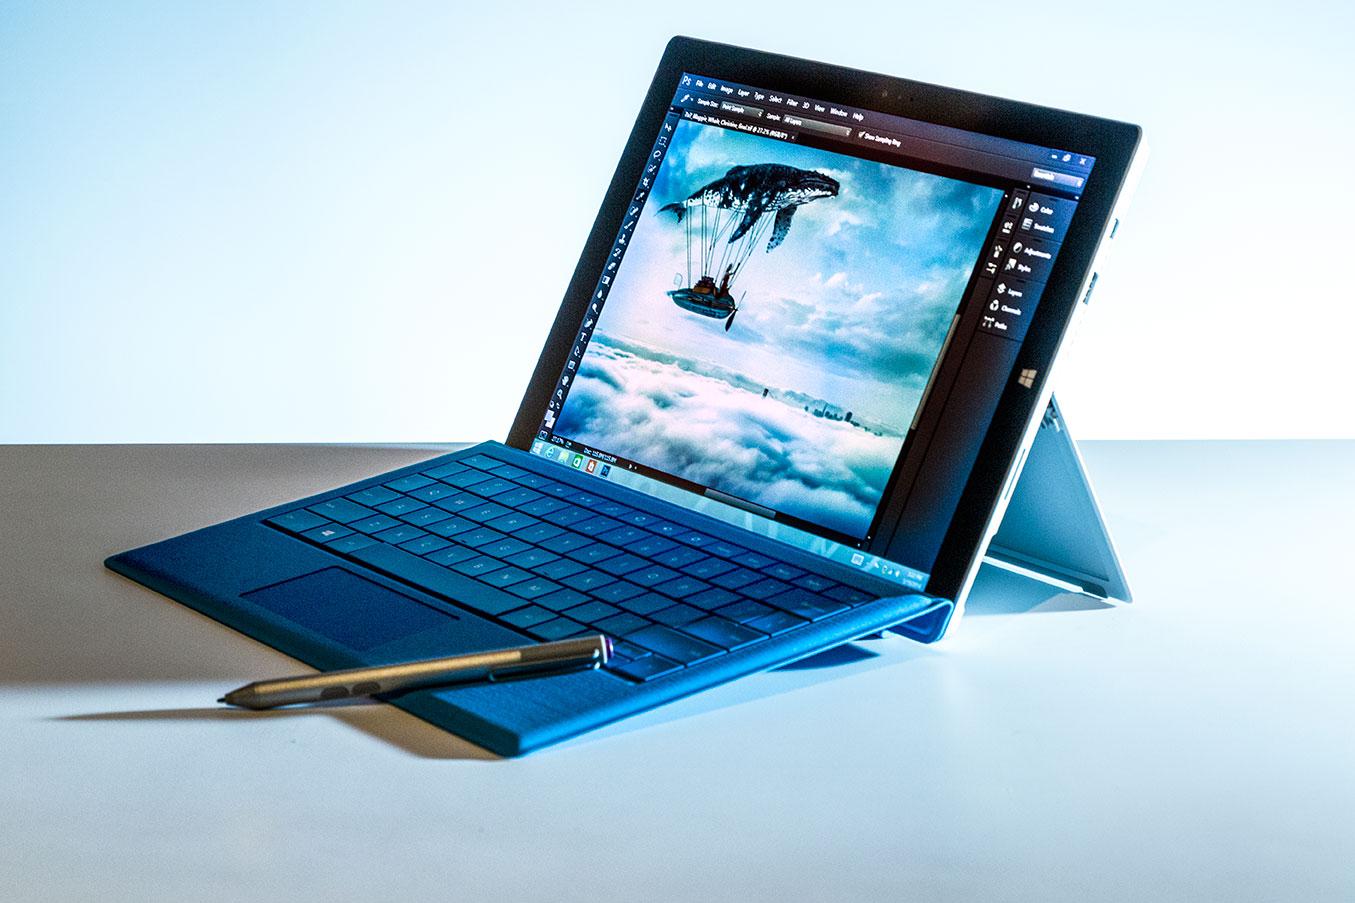 Nok en gang rammes Surface Pro 3 av omfattende batteriproblemer.